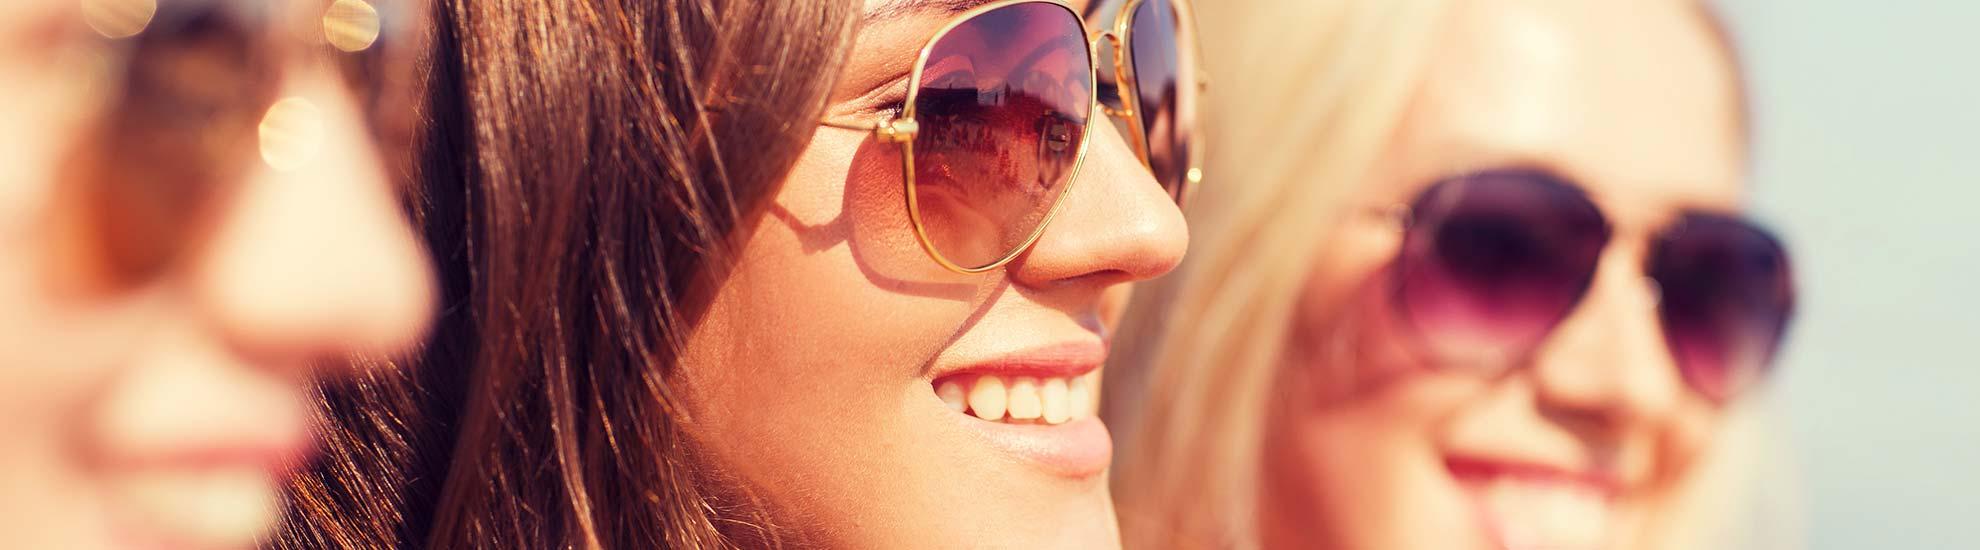 Group of women wearing sunglasses